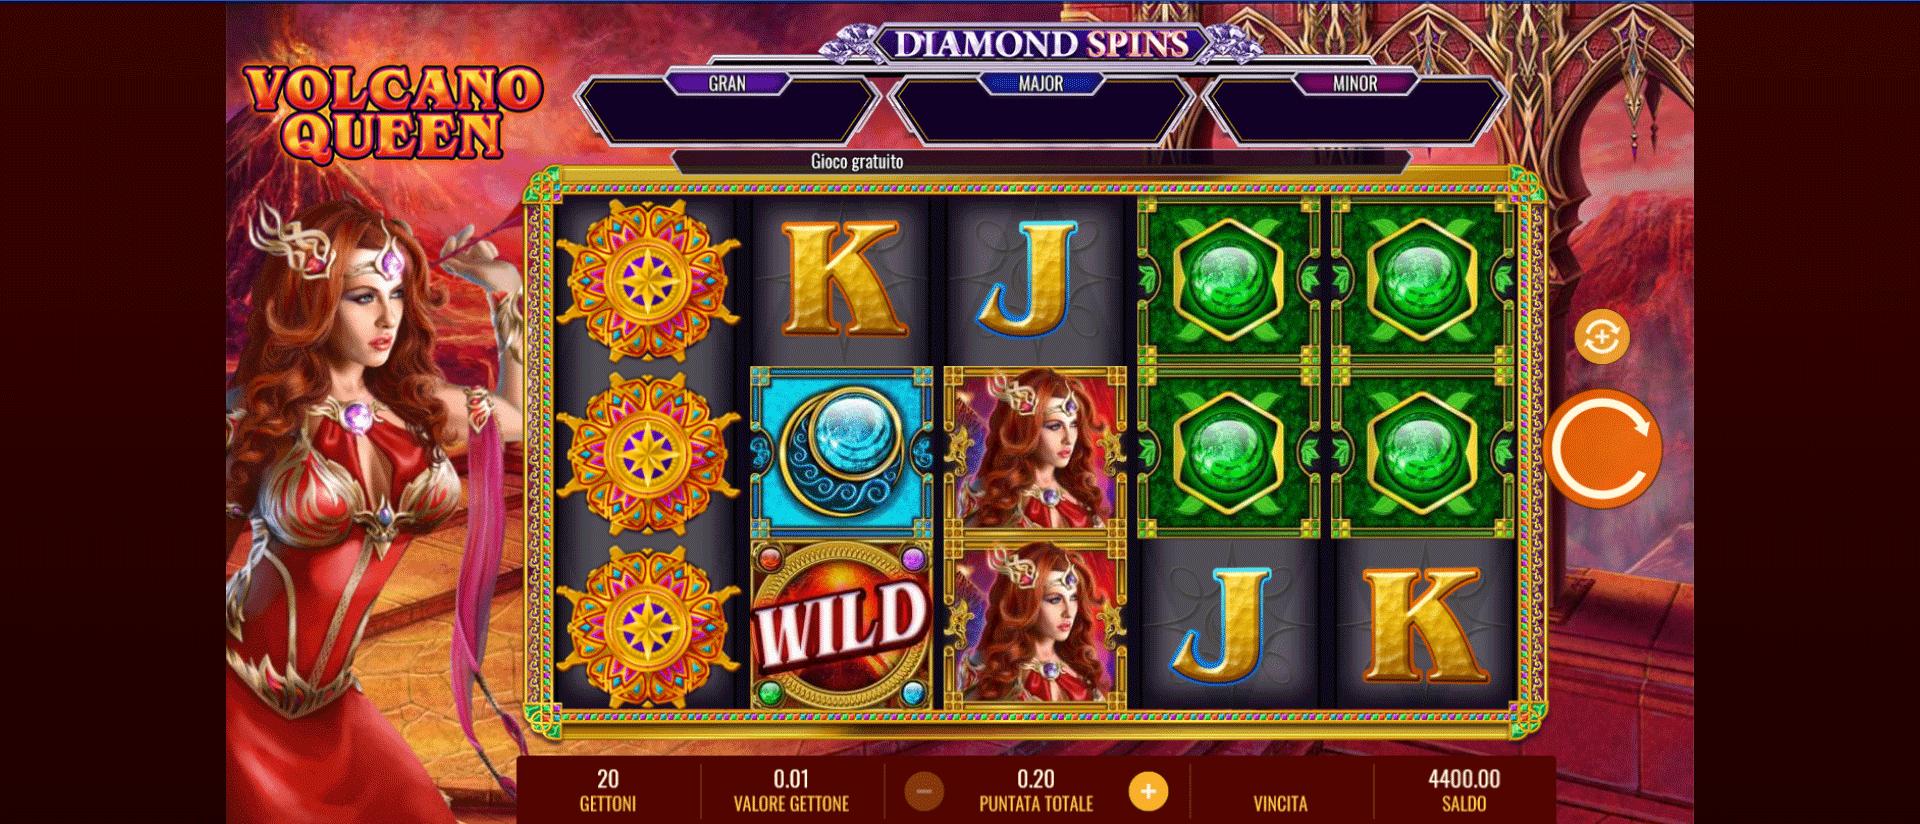 Slot Volcano Queen Diamond Spins